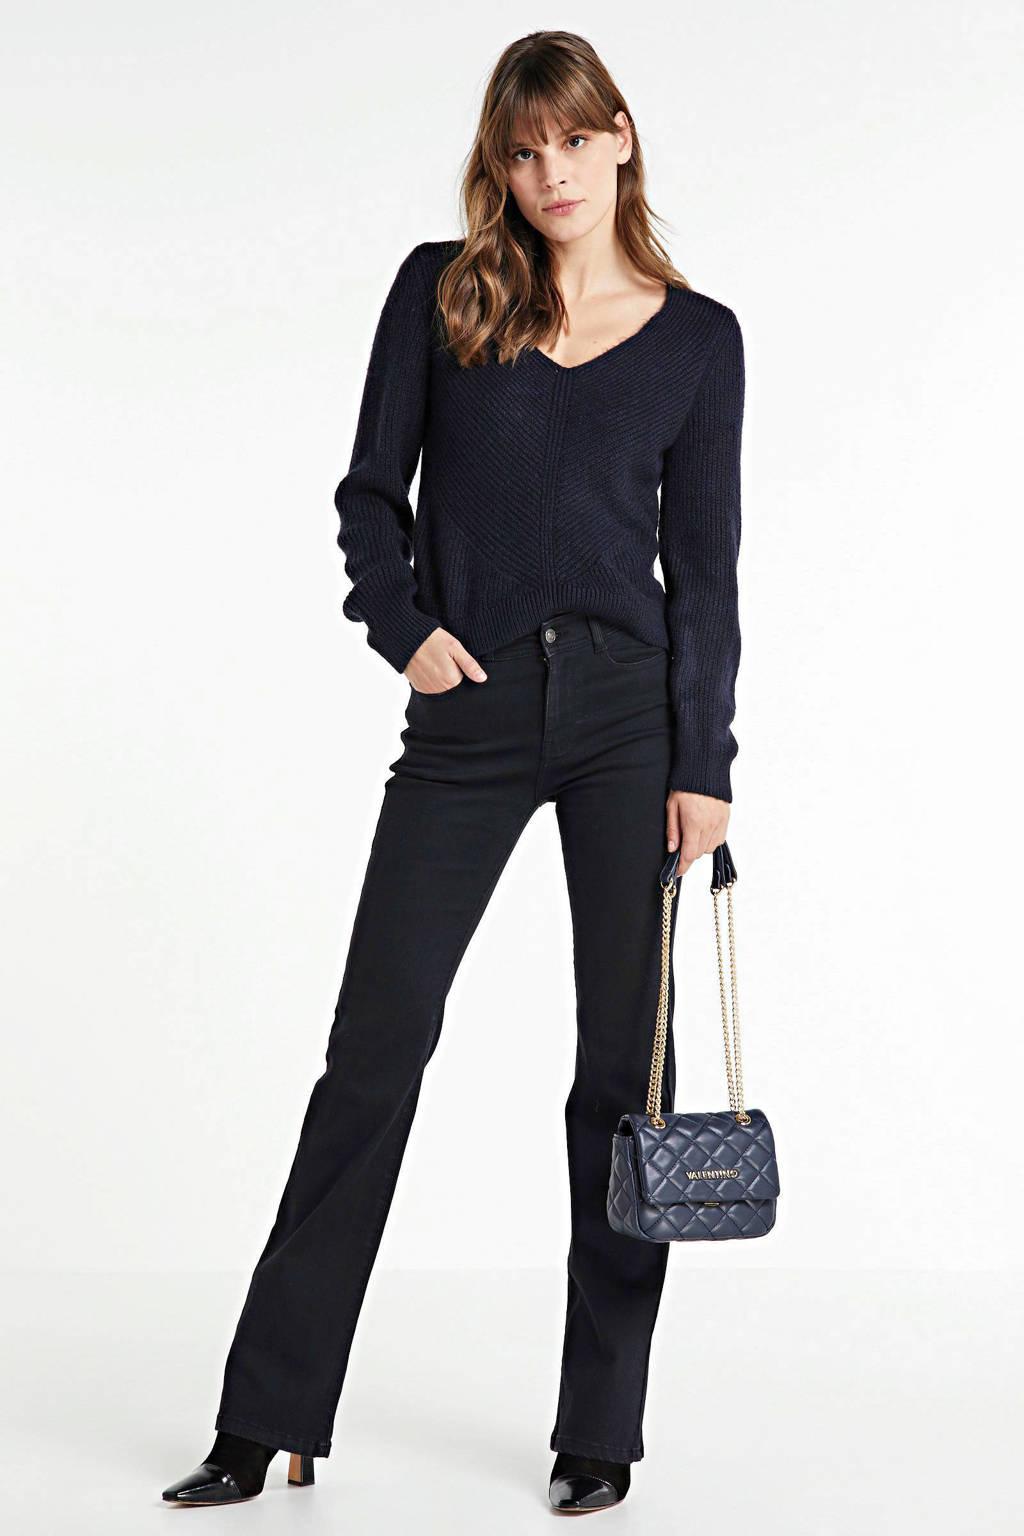 ONLY trui met printopdruk donkerblauw, Donkerblauw